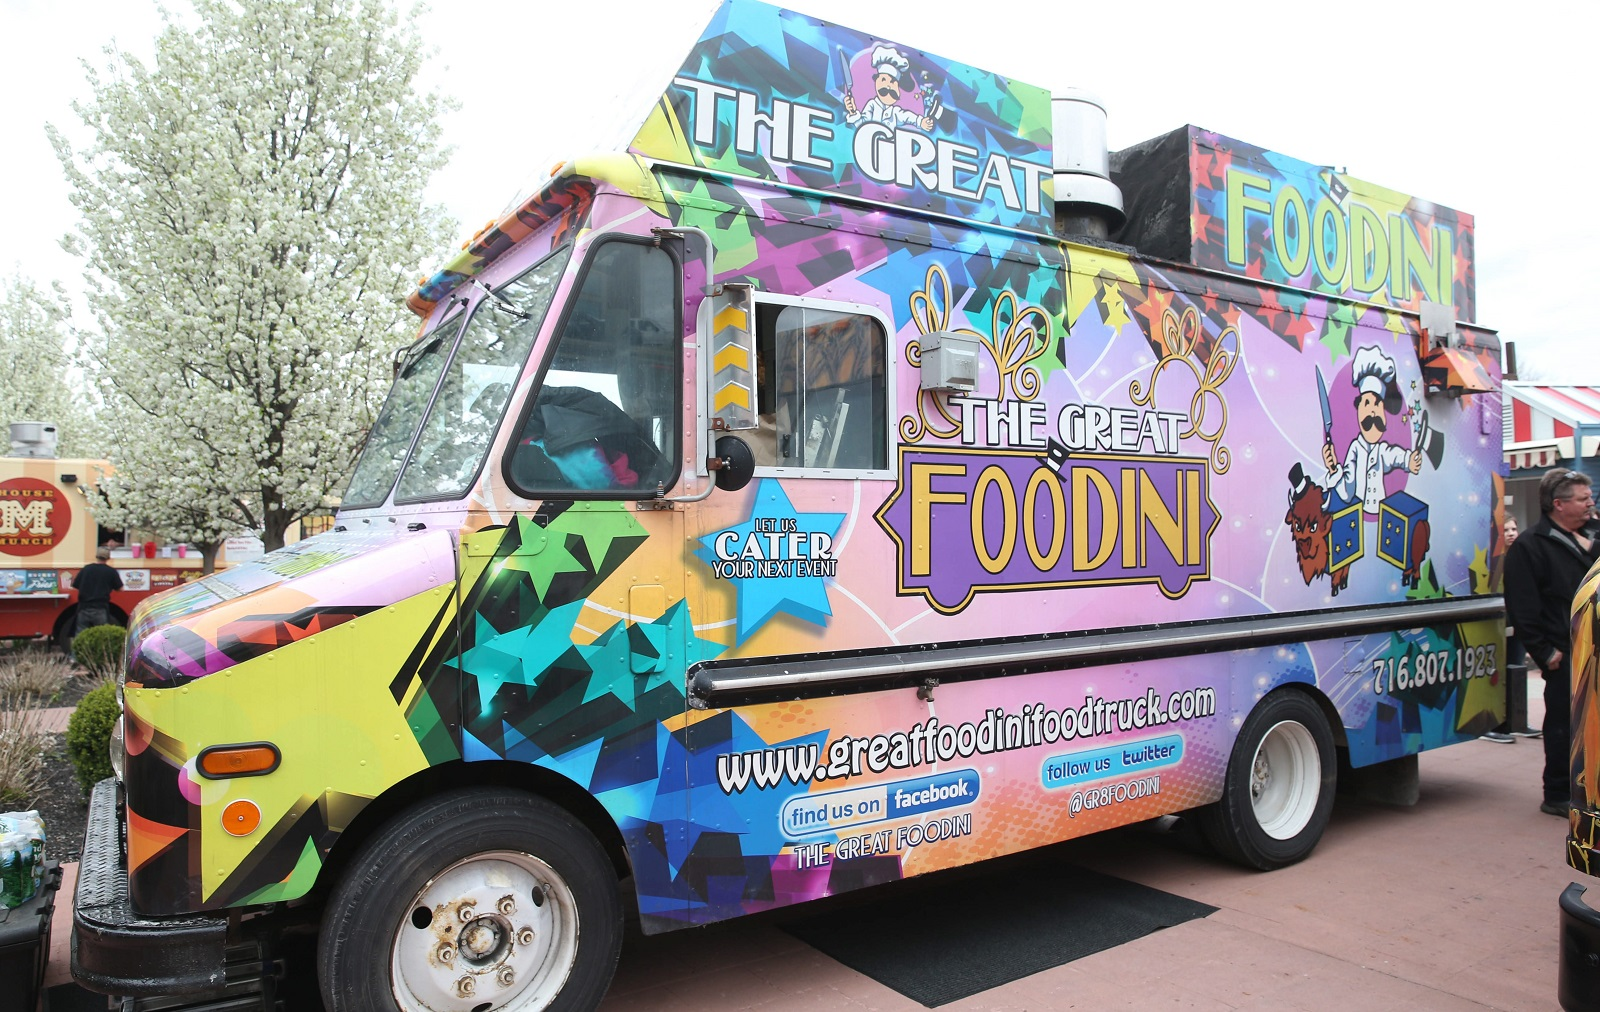 The Great Foodini food truck sets up shop at Food Truck Tuesdays. (Sharon Cantillon/Buffalo News)